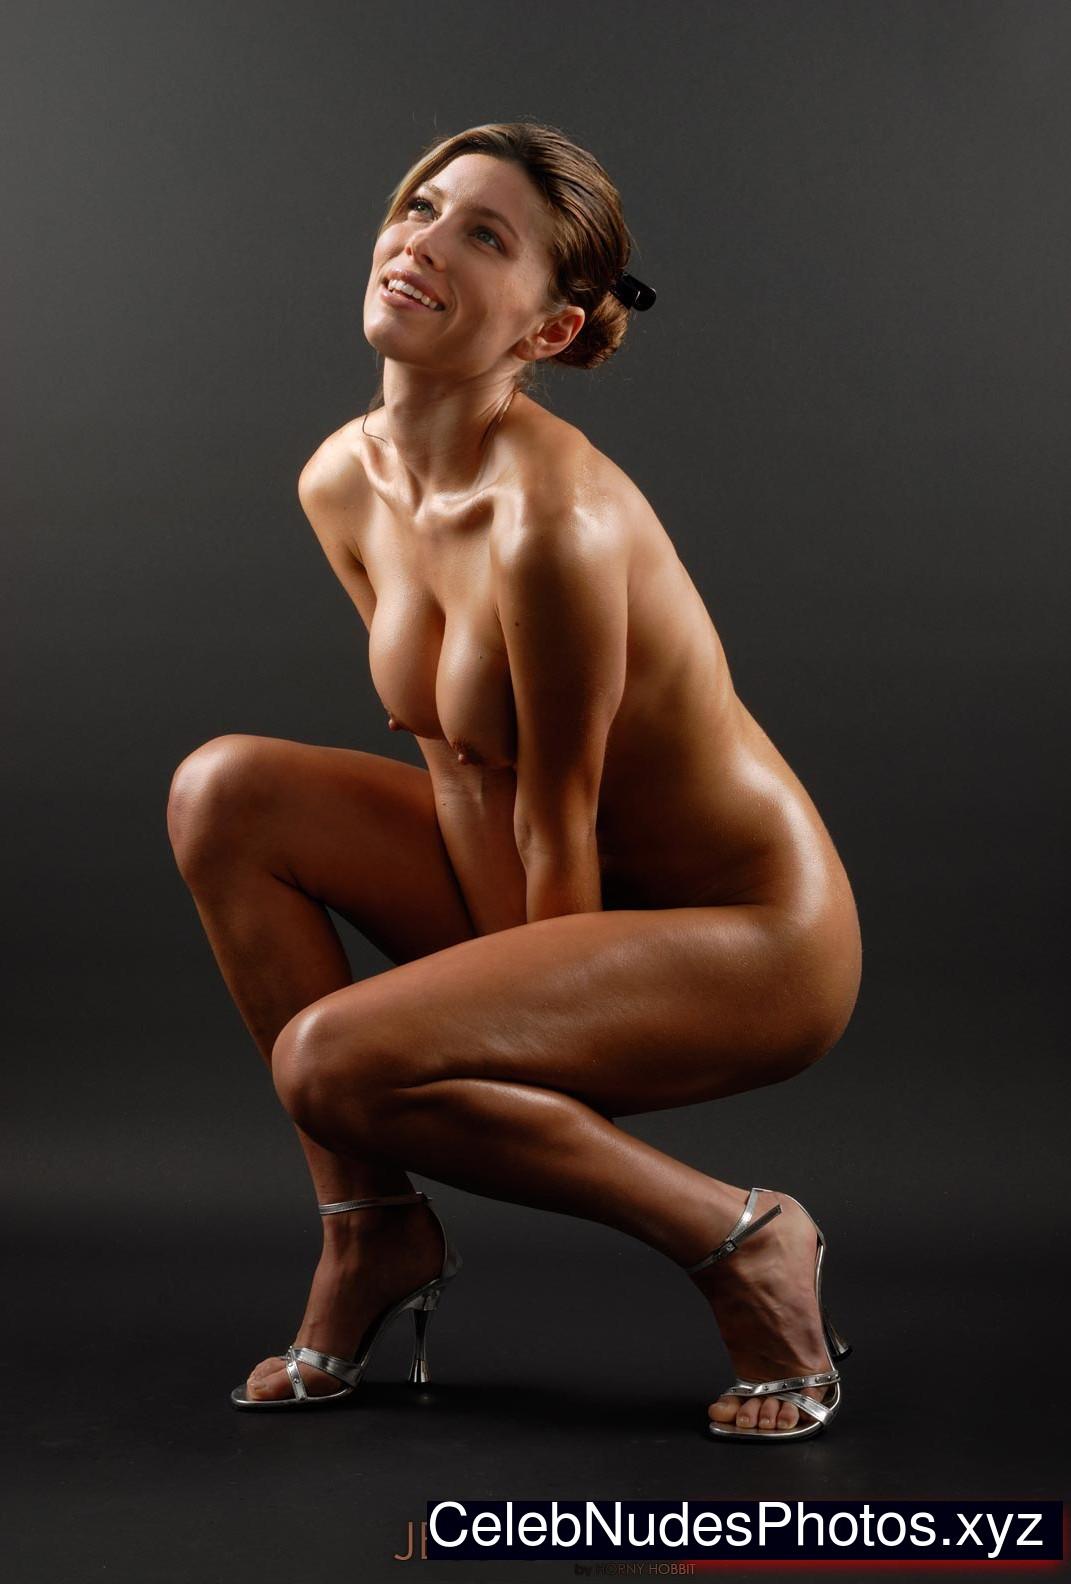 Jessica Biel Nude Celeb Pic sexy 6